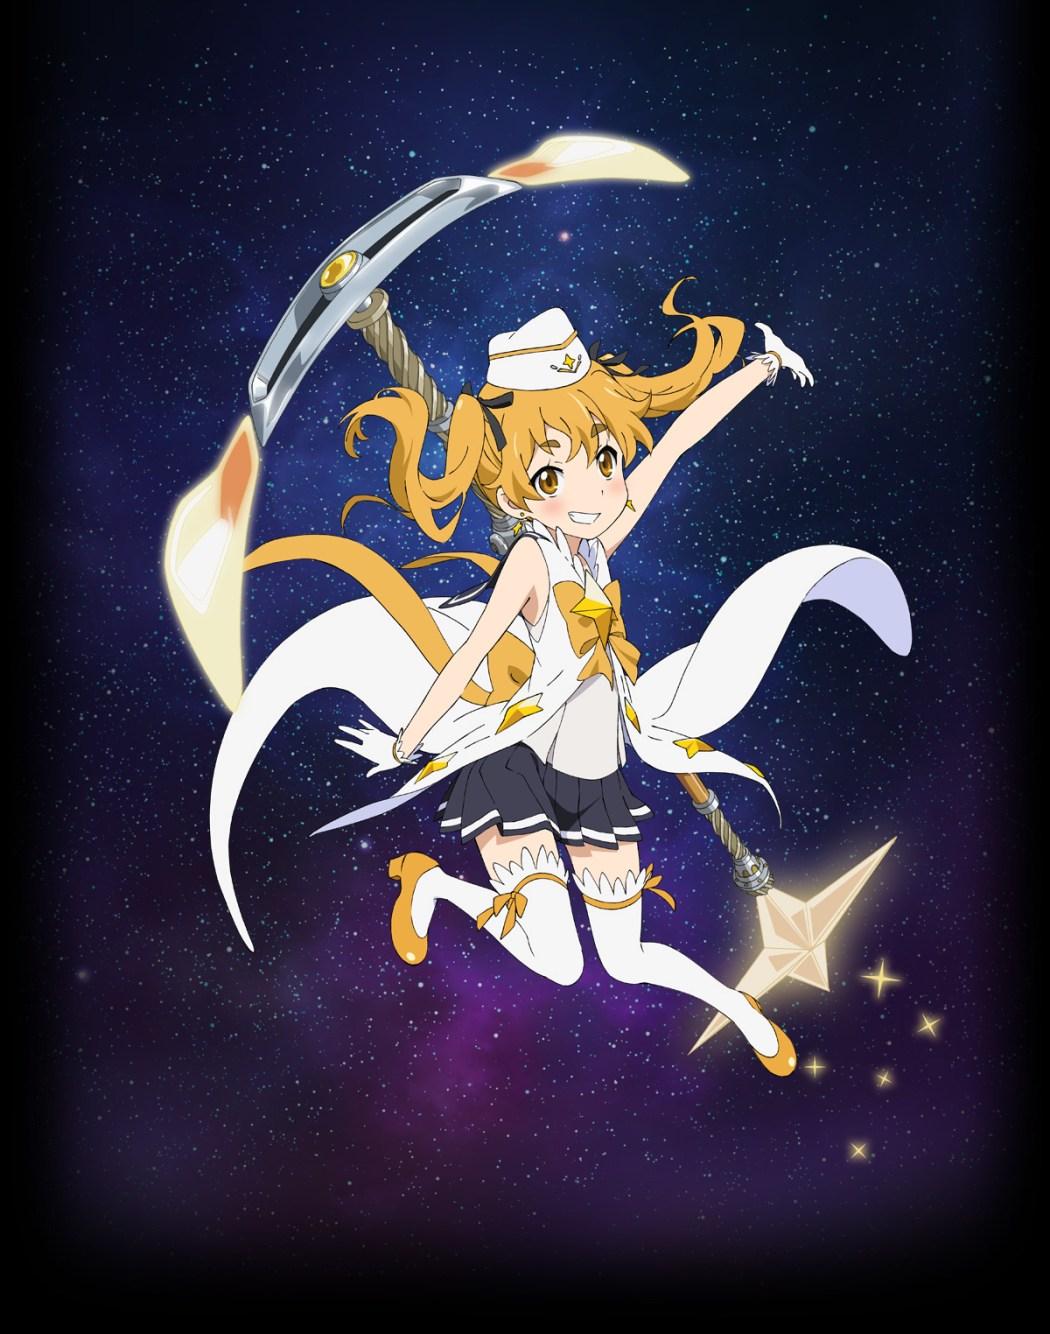 Houkago no Pleiades character design haruhichan.com wish upon the pleiades character design Hikaru